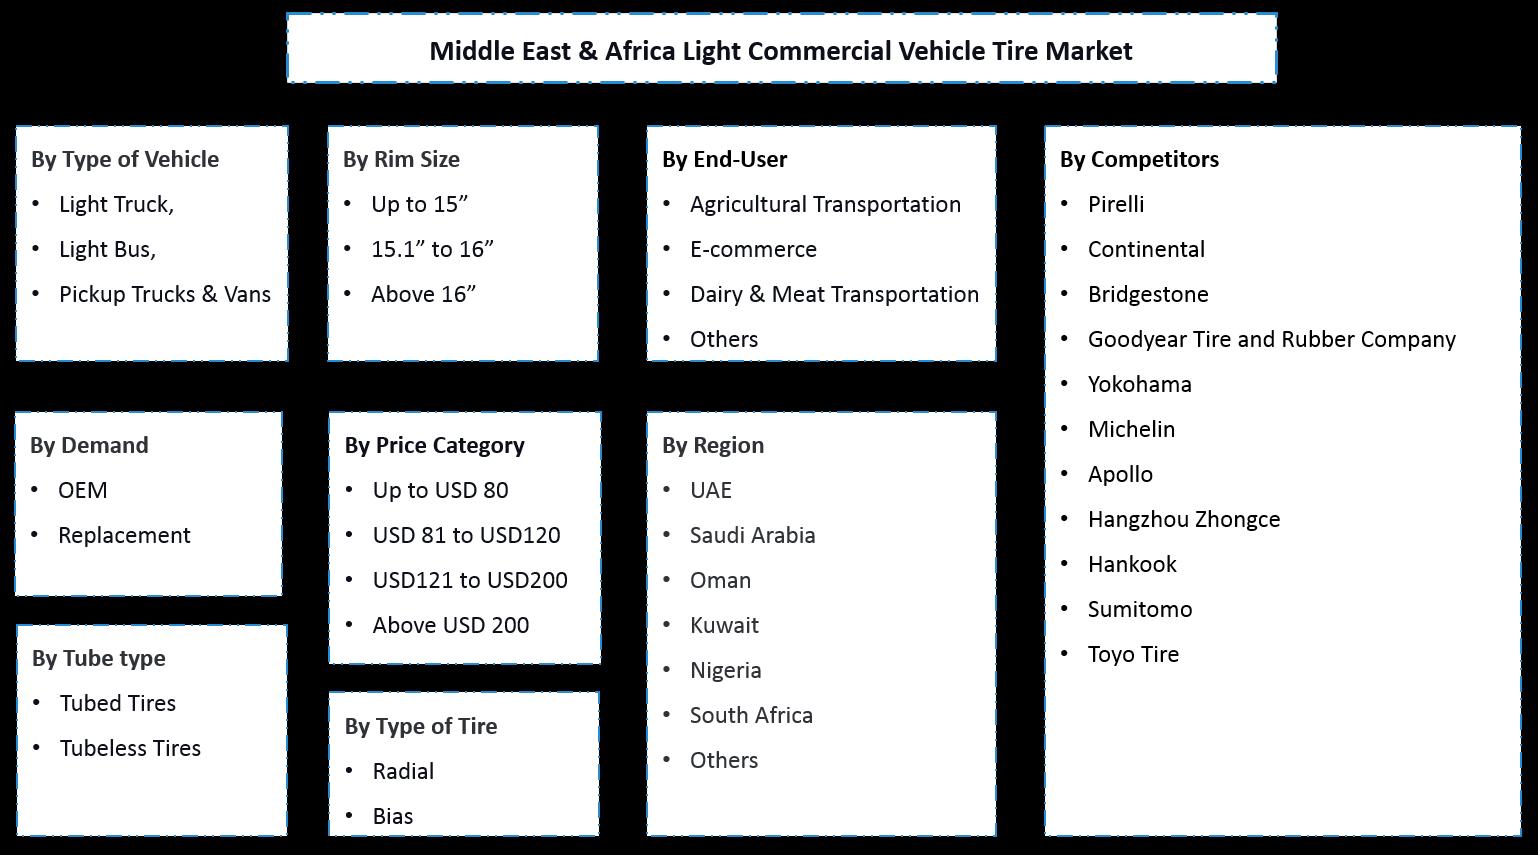 Middle East & Africa Light Commercial Vehicle Tire Market Segmentation